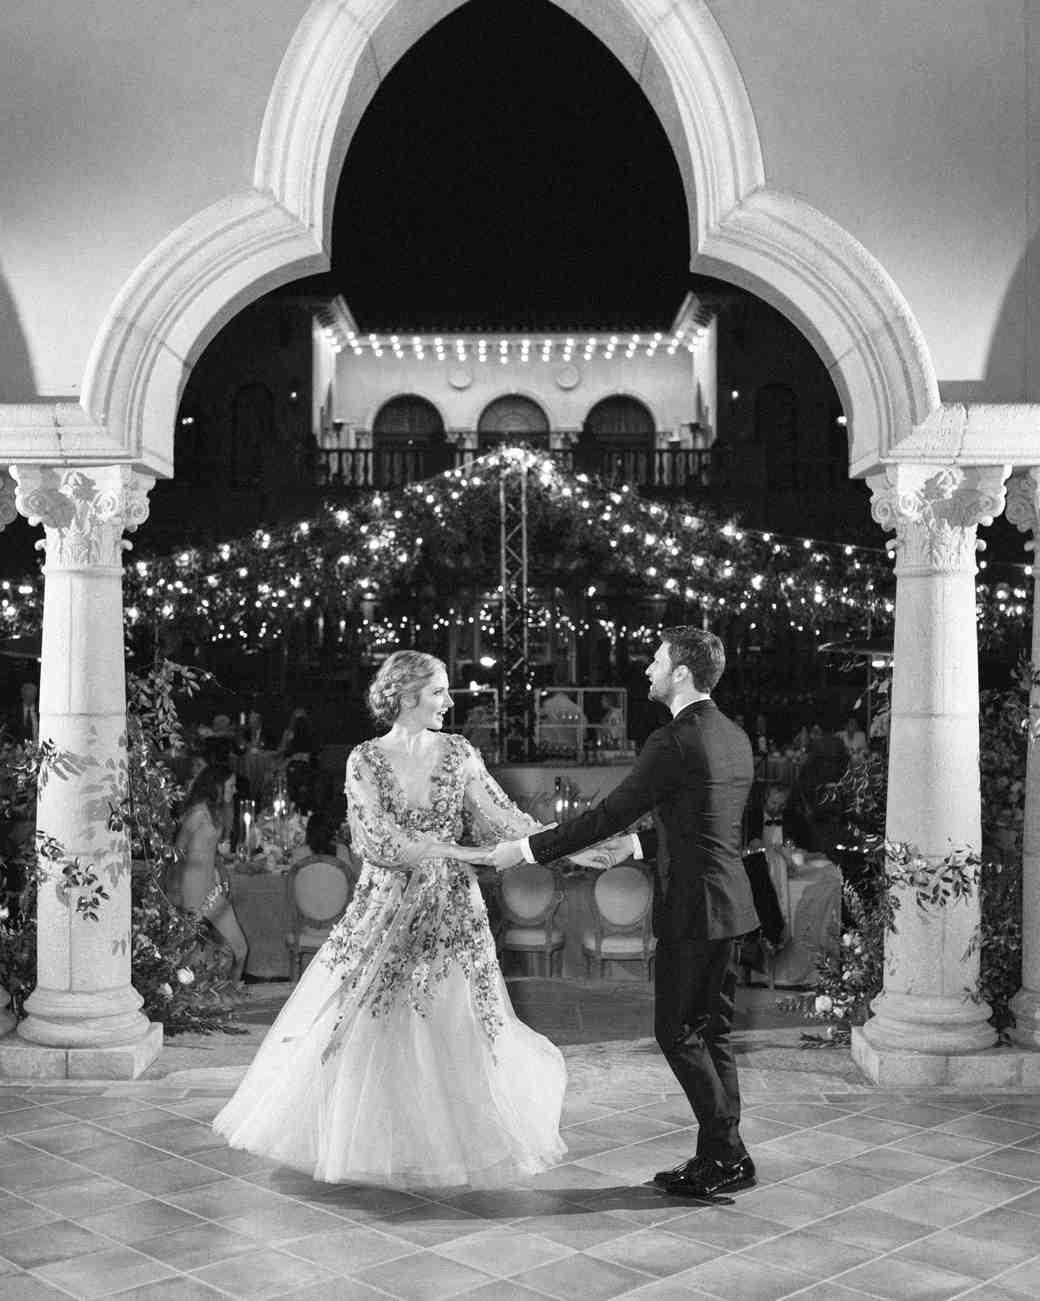 cavin david wedding couple first dance